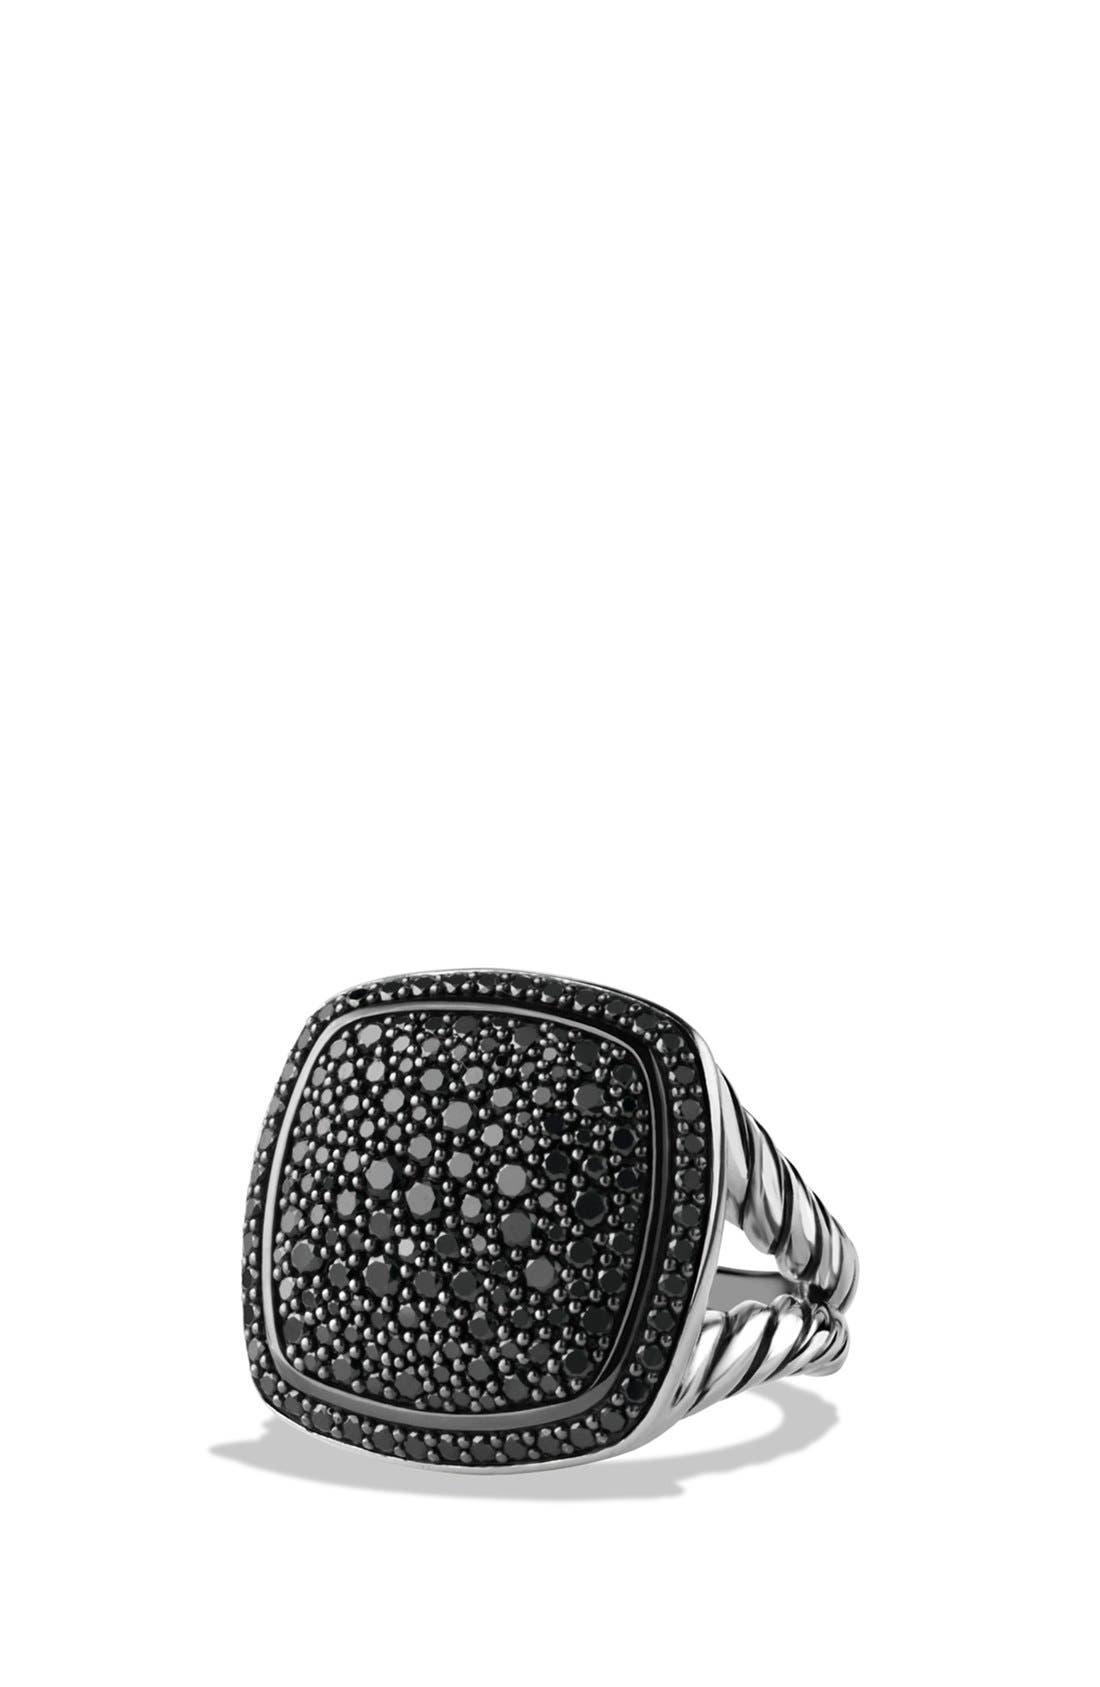 'Albion' Ring with Diamonds,                         Main,                         color, Black Diamond